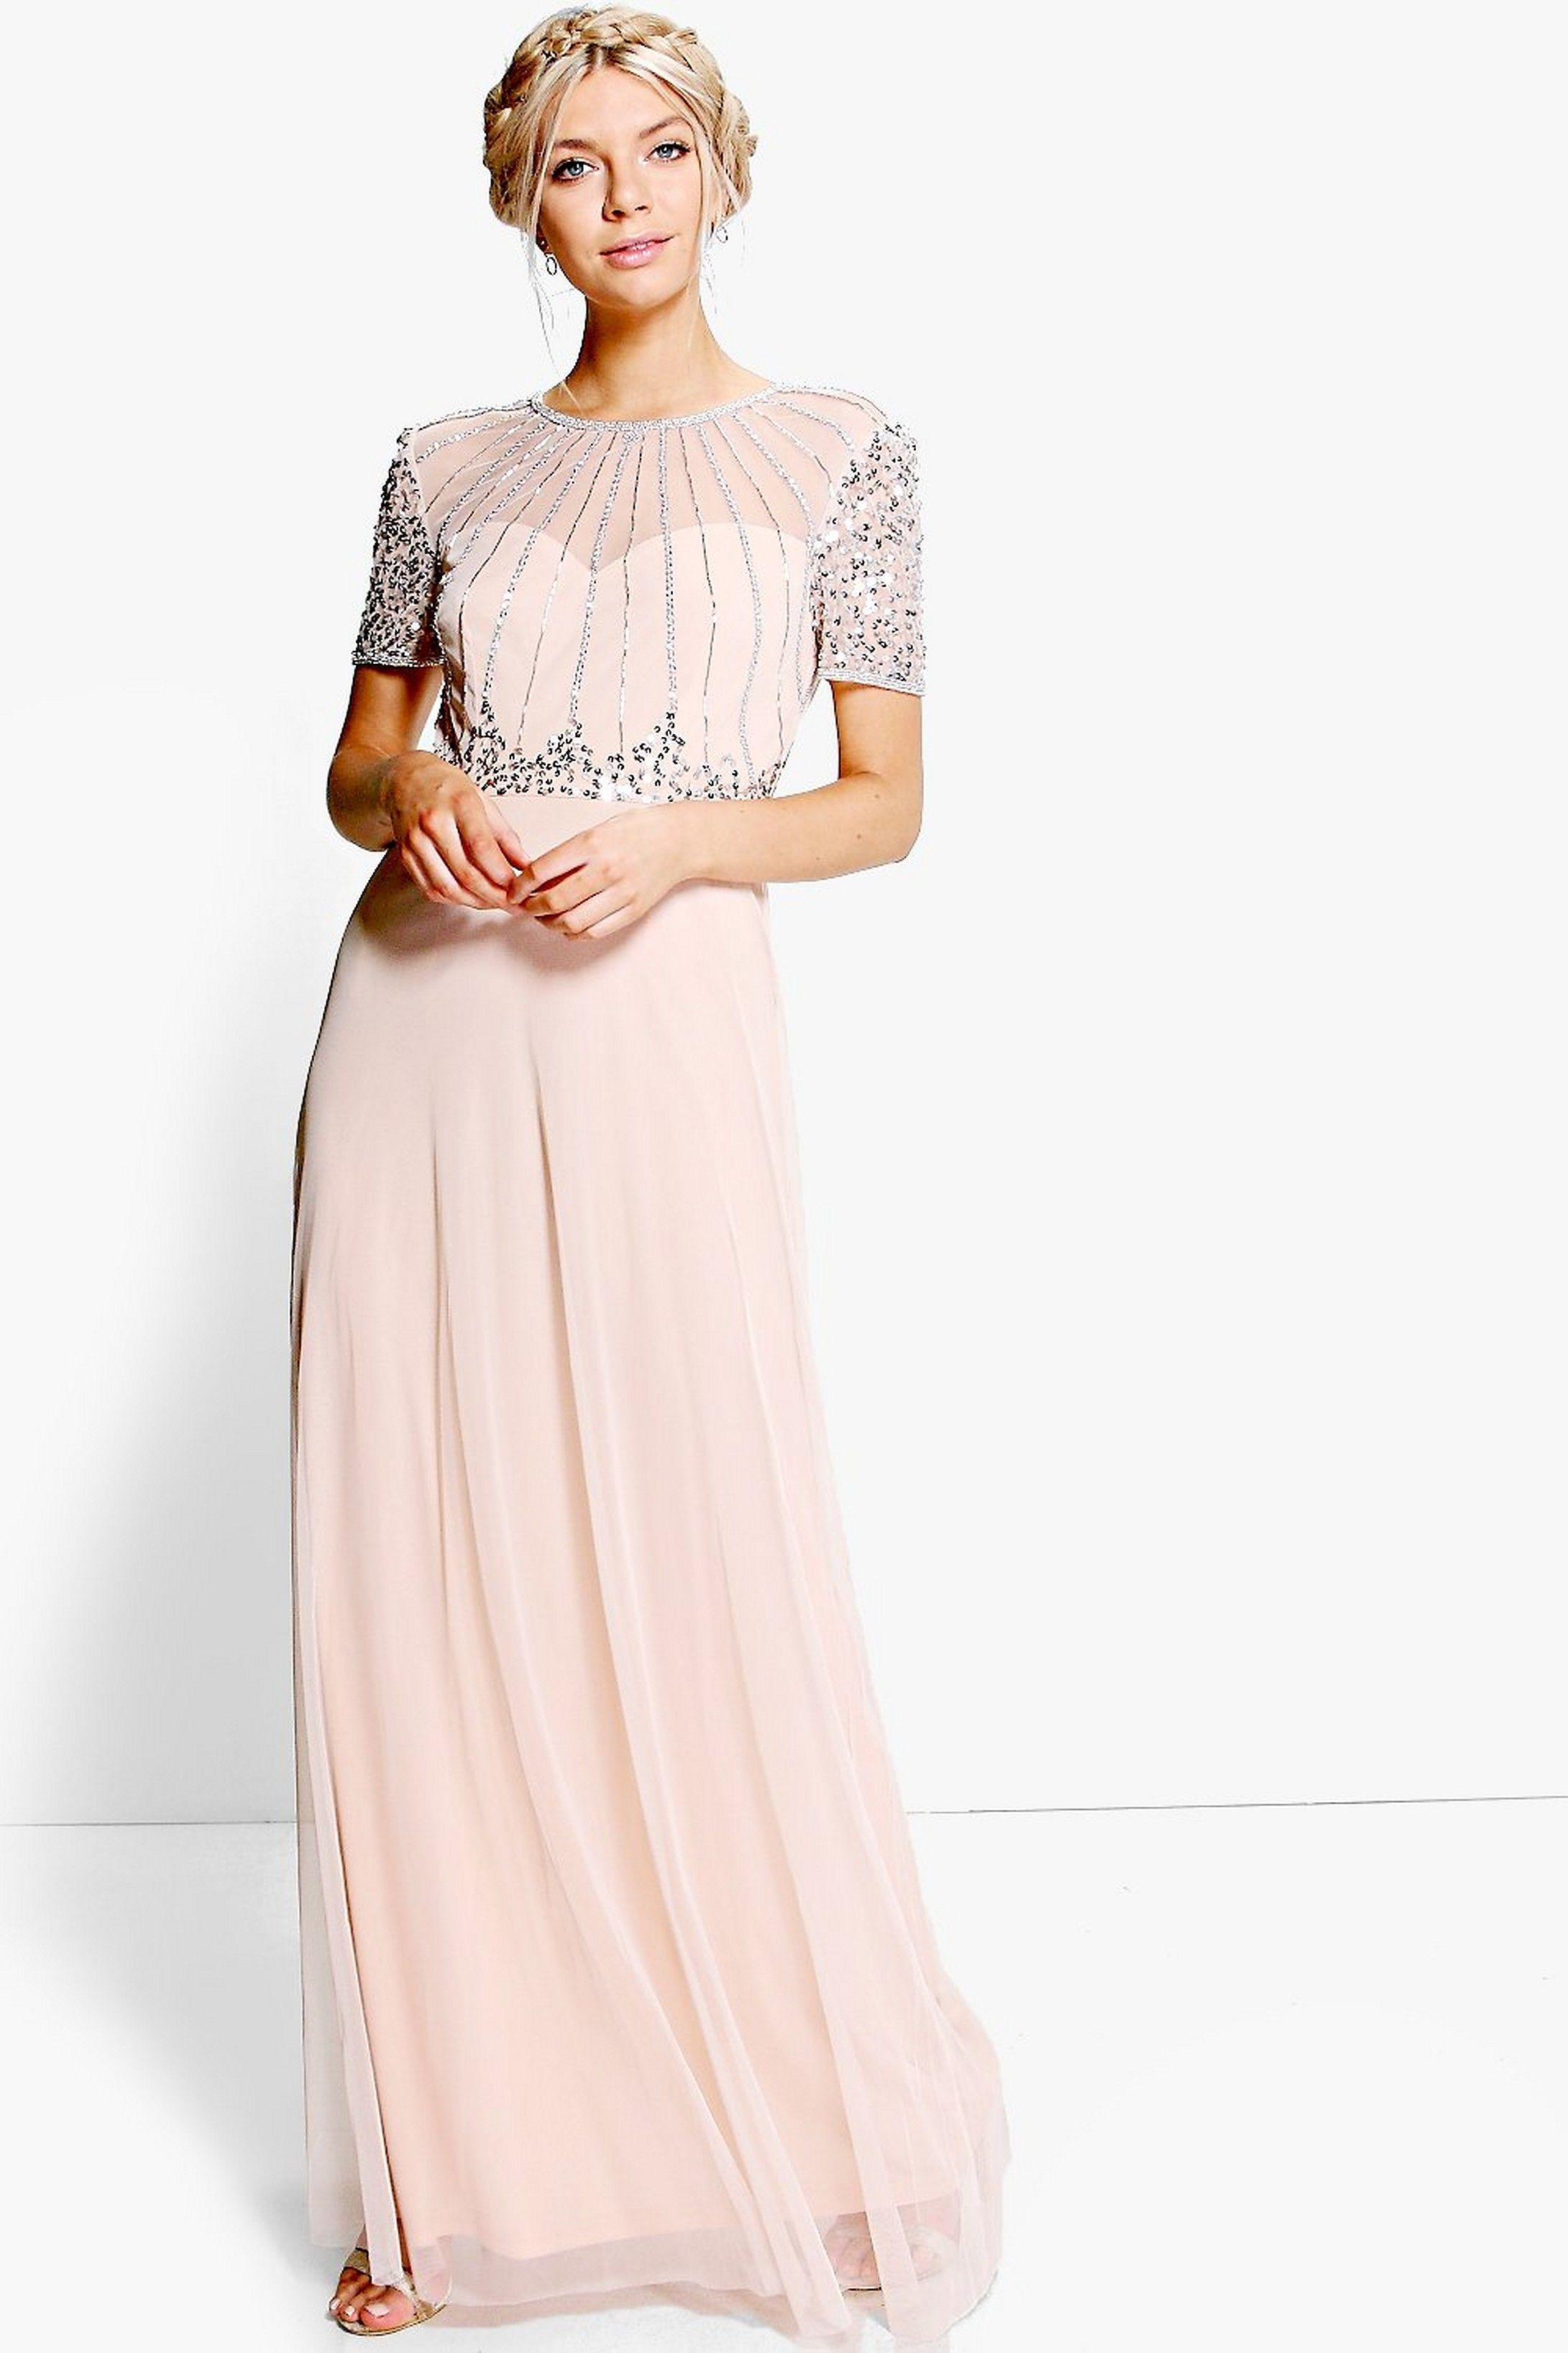 Boutique Beaded Maxi Bridesmaid Dress Boohoo Uk Beaded Maxi Dress Maxi Bridesmaid Dresses Maxi Dress